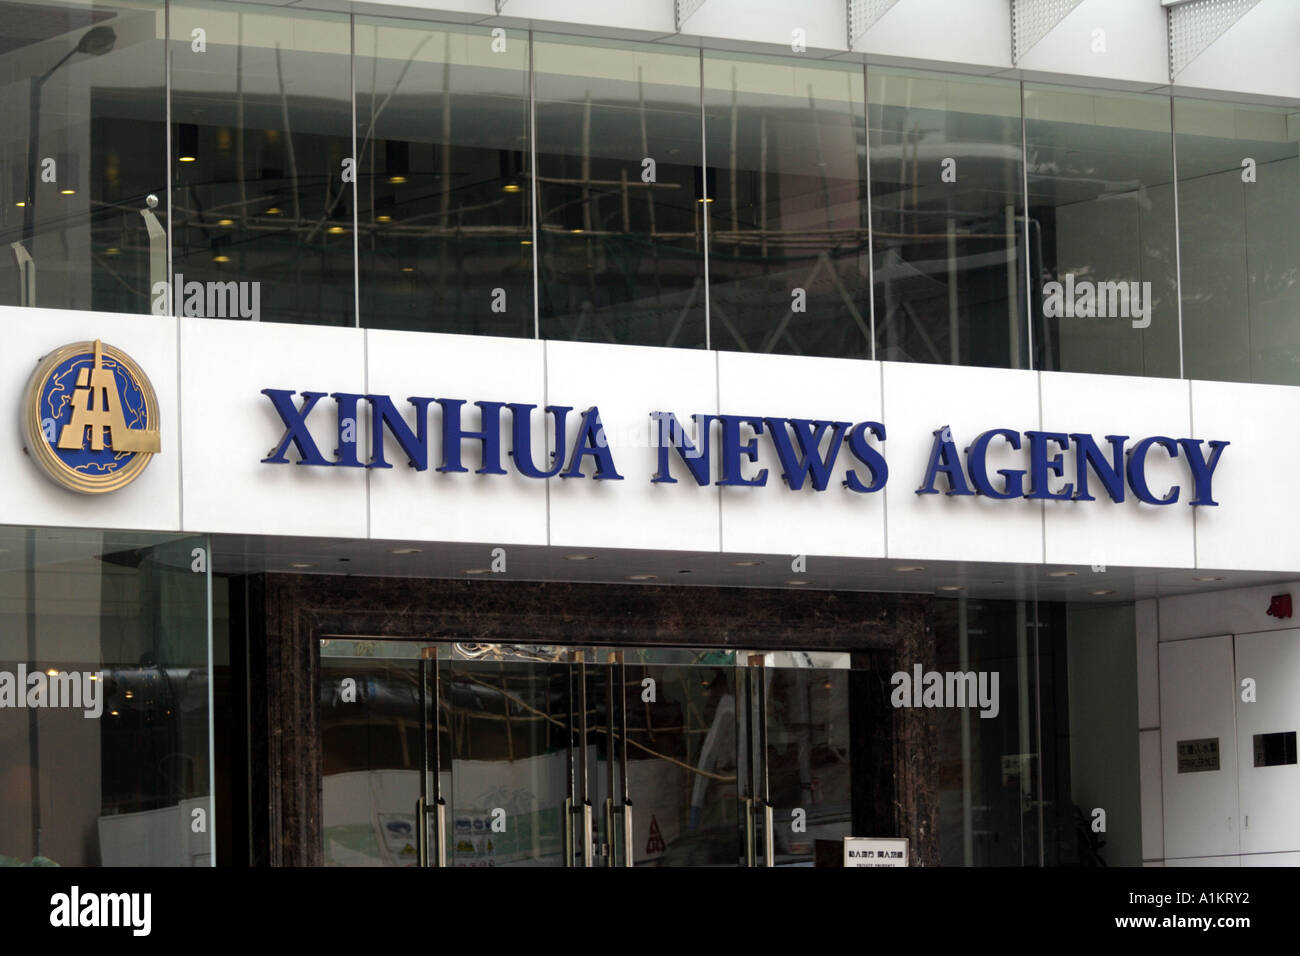 Xinhua News Agency in Hong Kong Stock Photo - Alamy